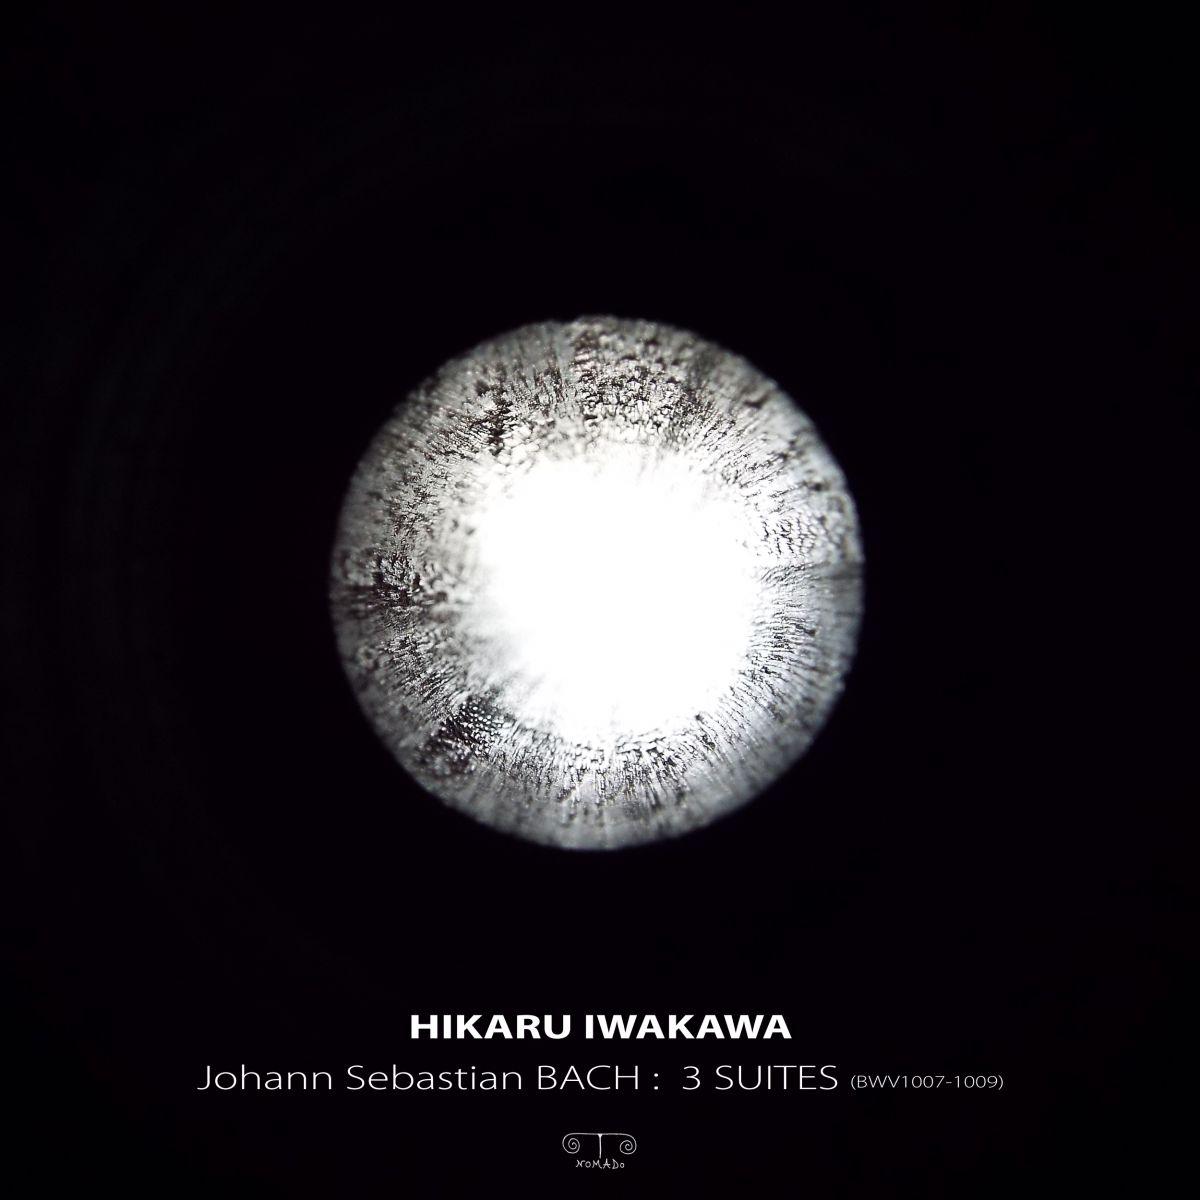 Imagen de Juan Sebastián Bach: 3 Suites de Hikaru Iwakawa